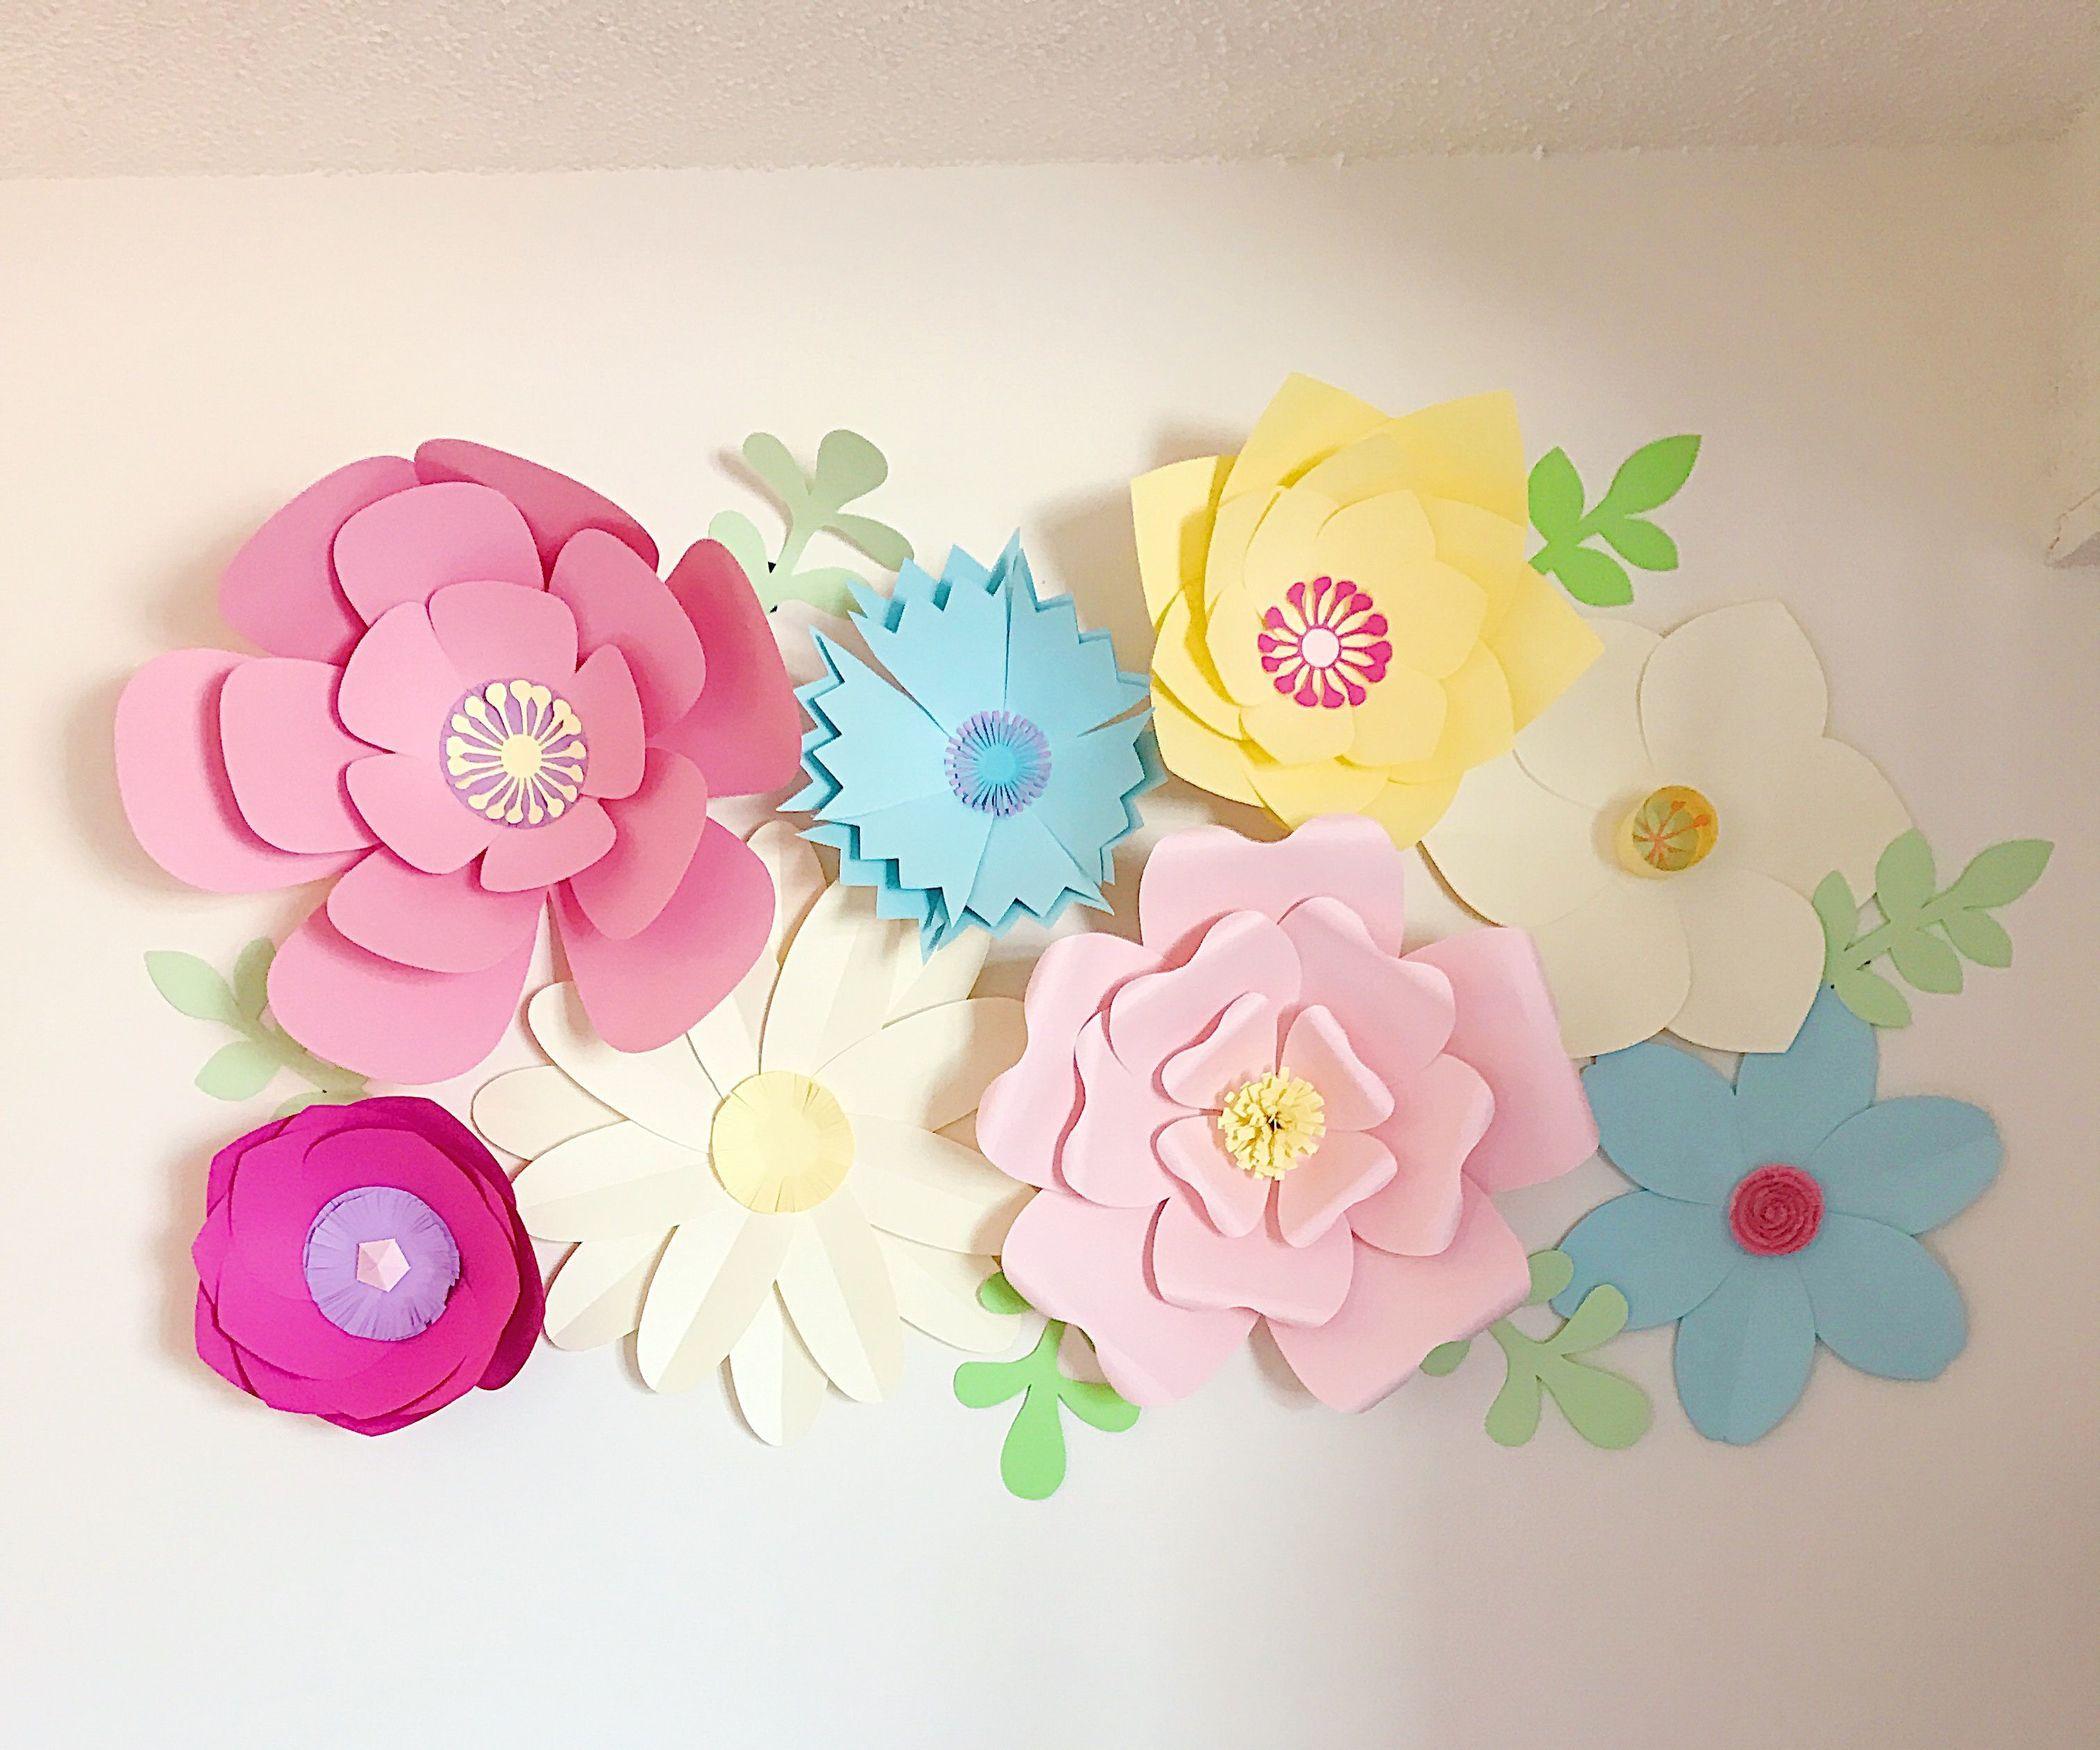 Giant Paper Flower Wall Decor  Flower wall decor Tissue flowers